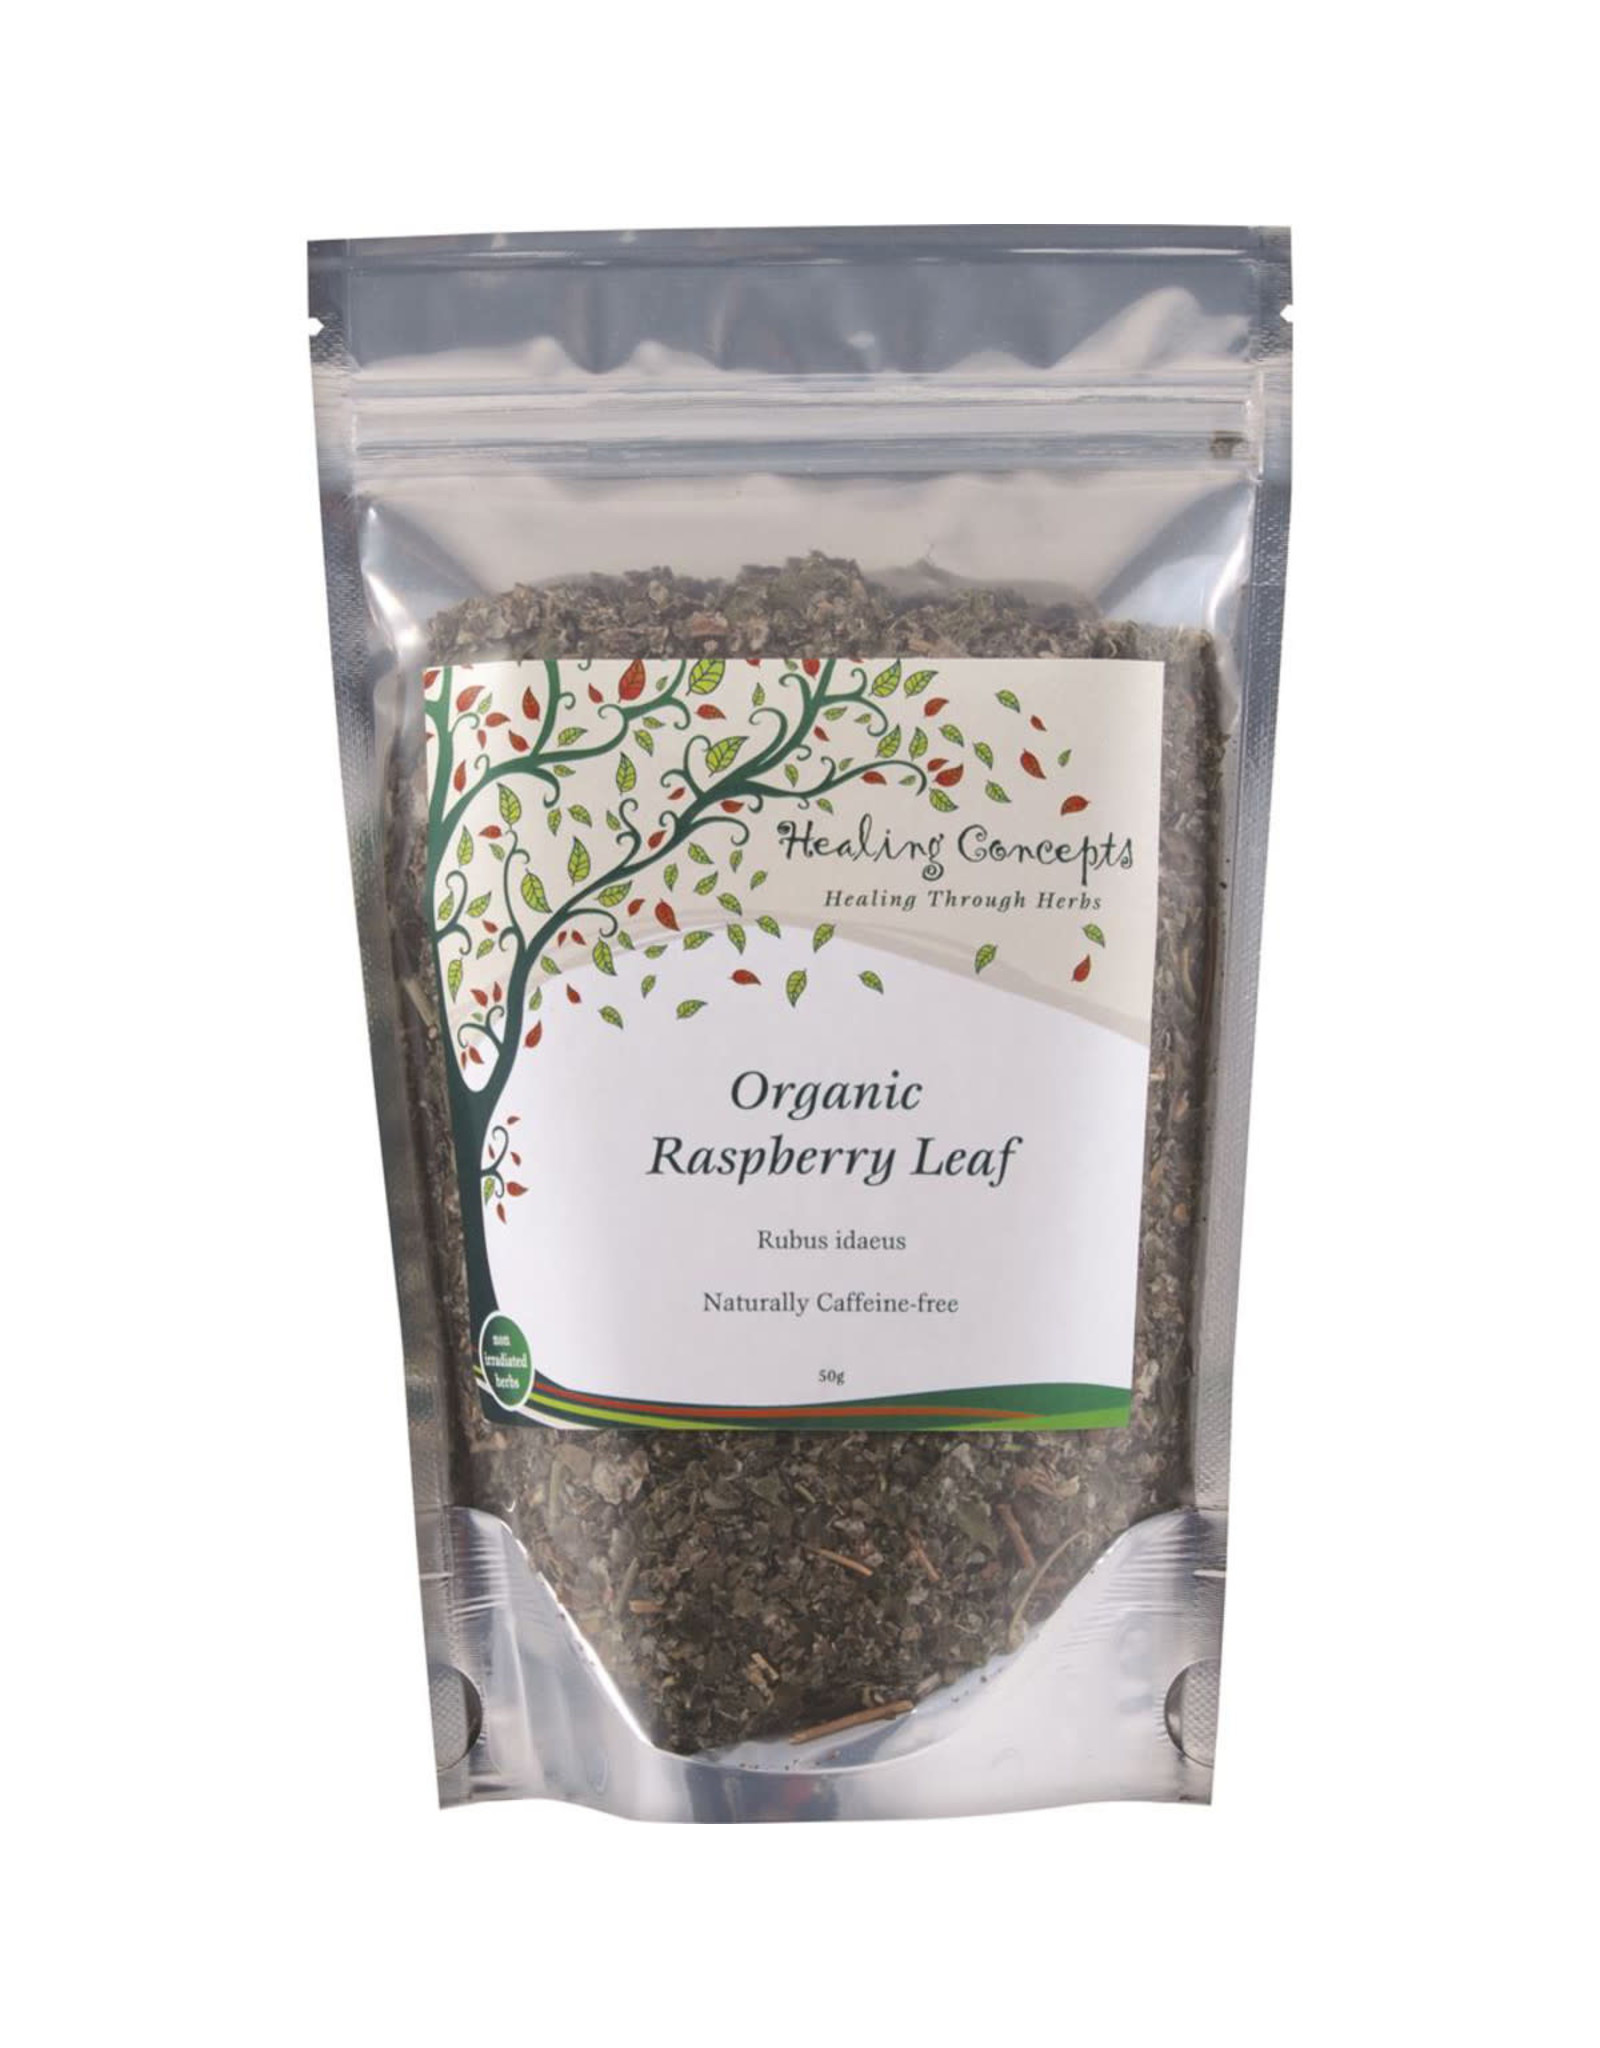 Healing Concepts Organic Raspberry Leaf Tea 50g